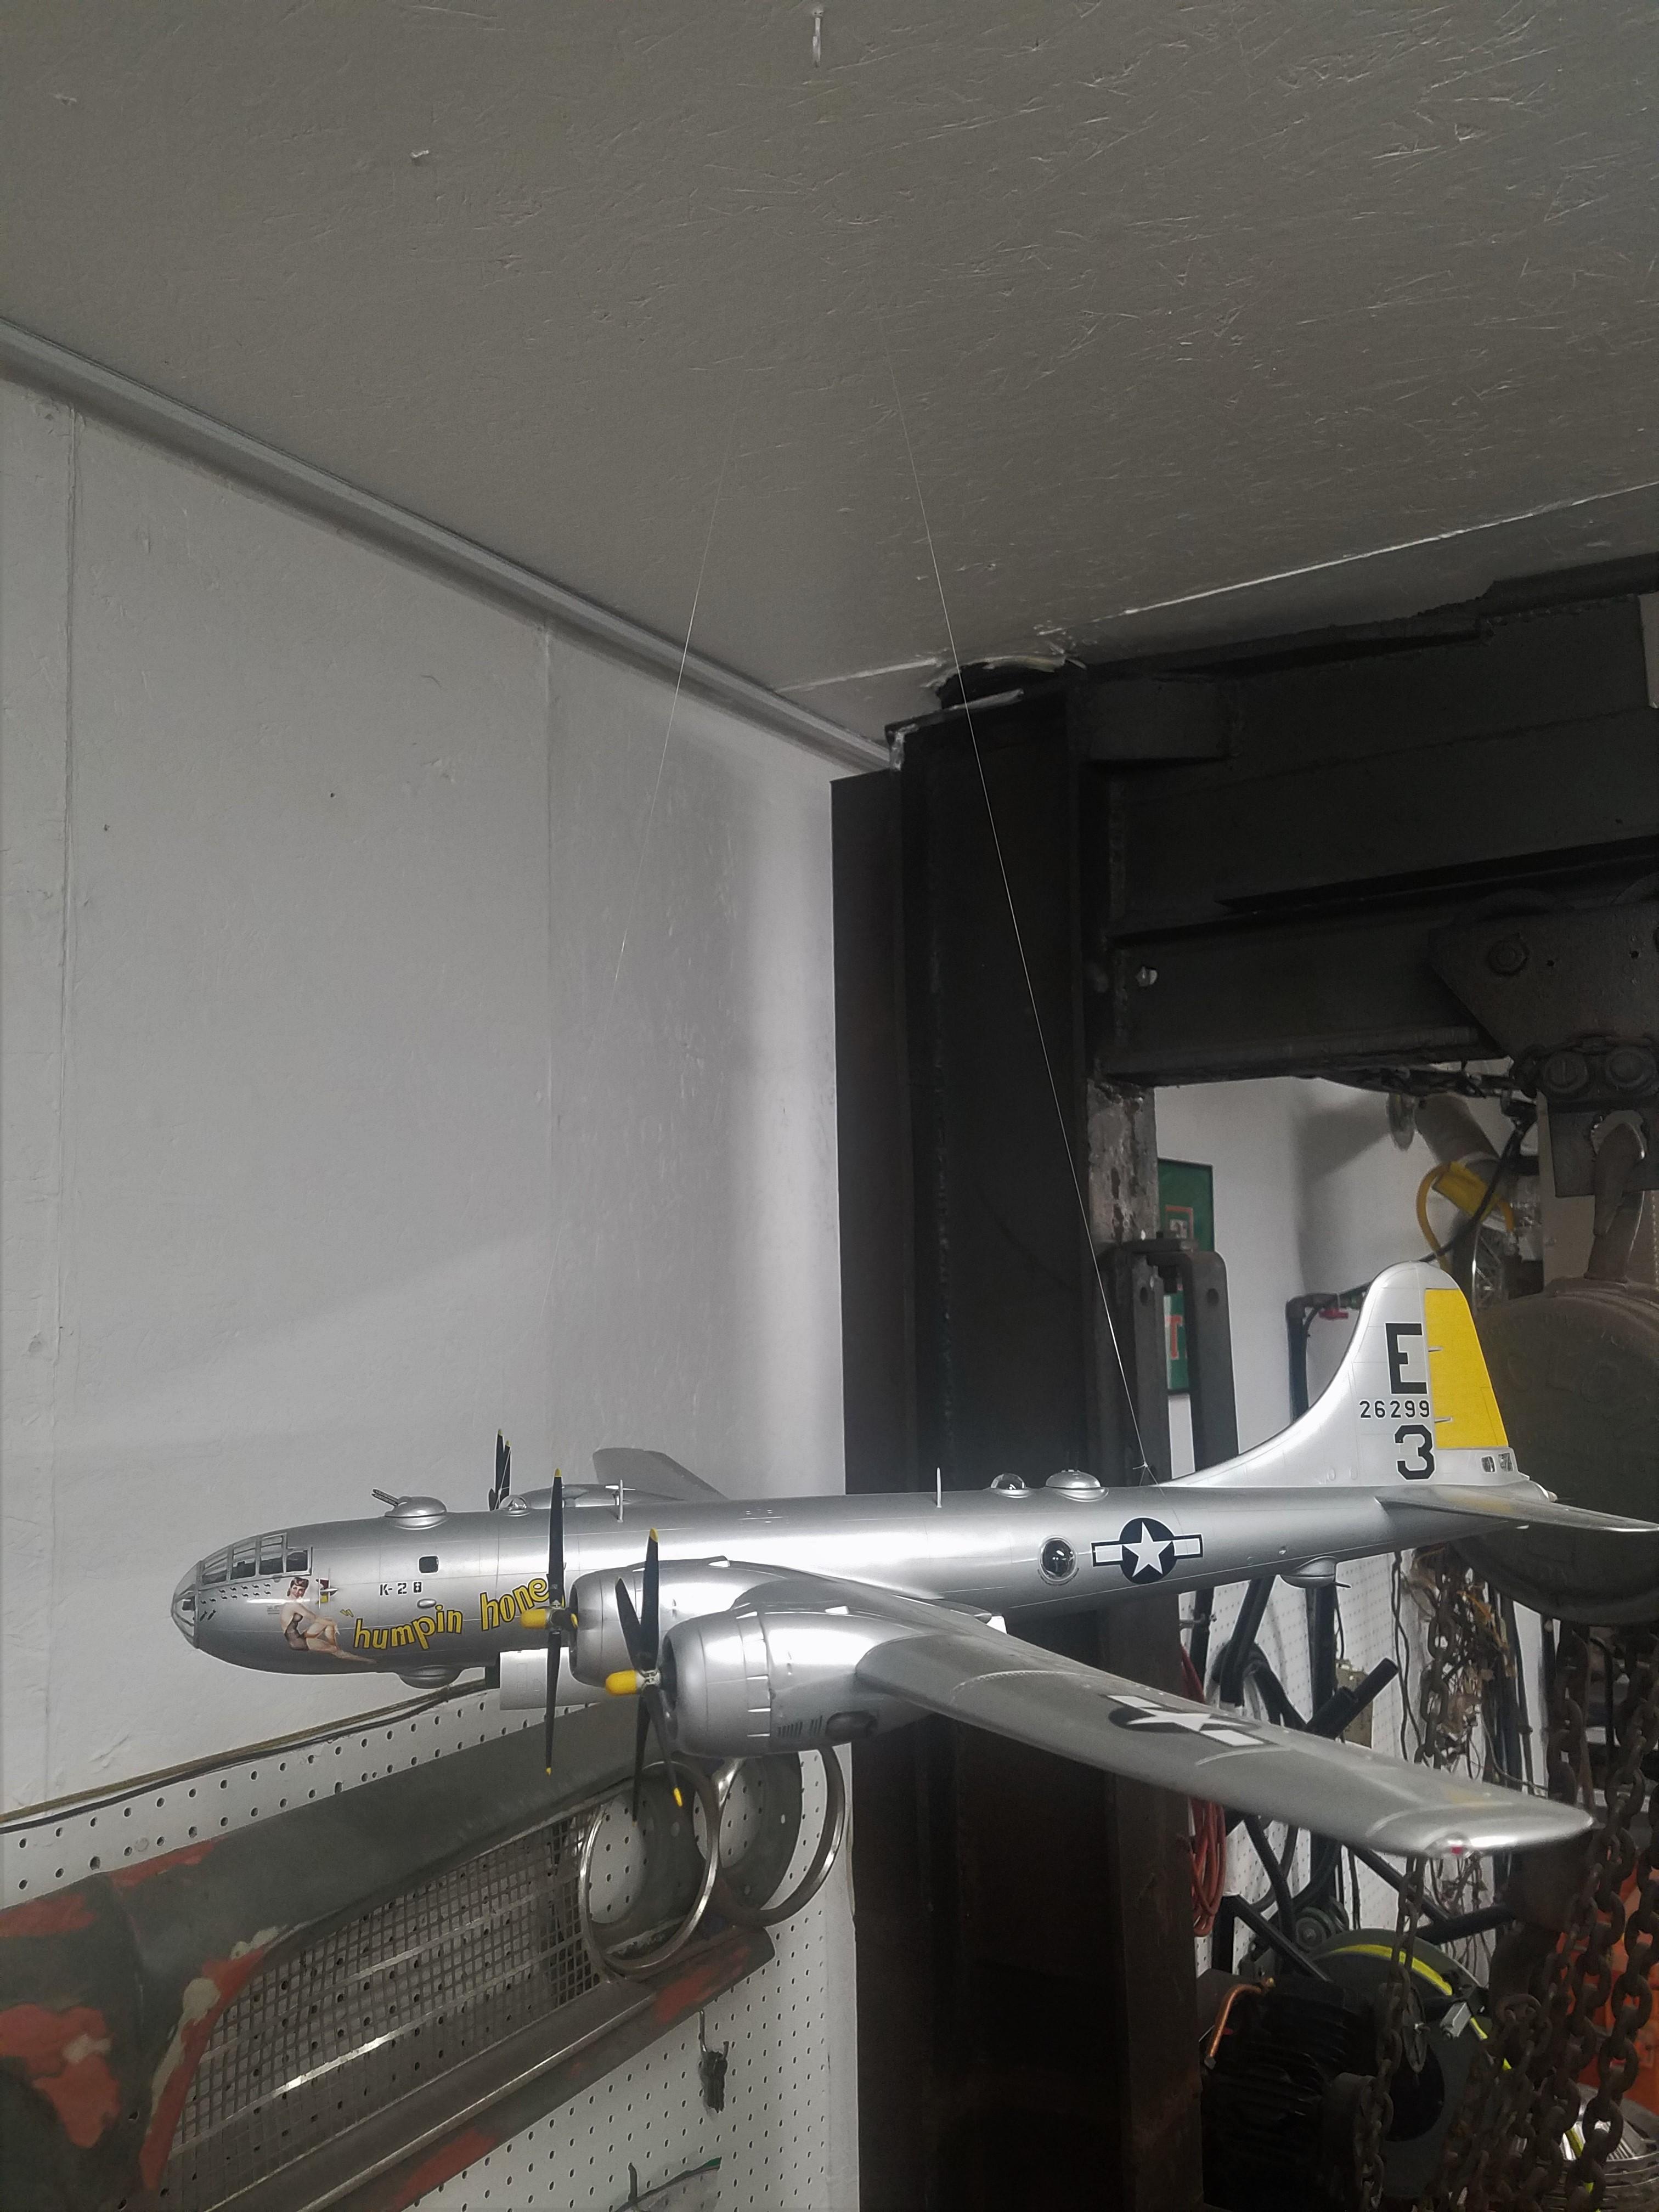 b-29 port.jpg